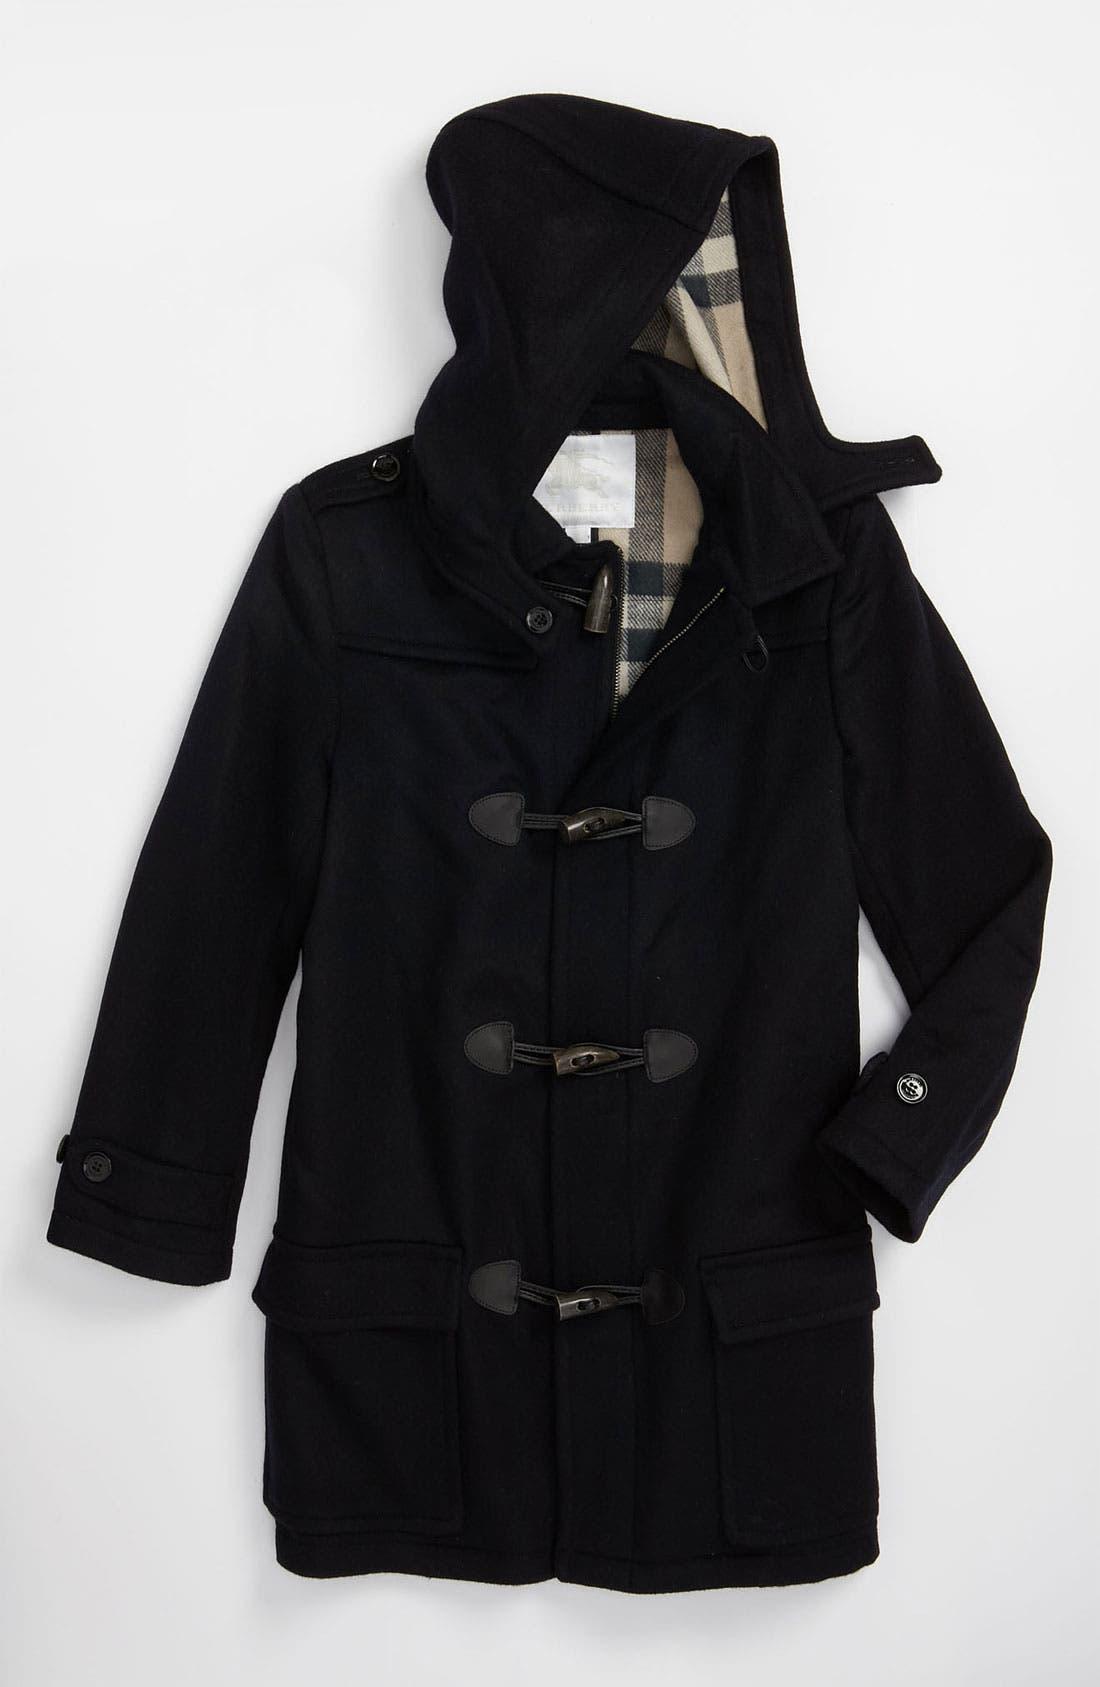 Alternate Image 1 Selected - Burberry Wool Duffle Coat (Little Boys)